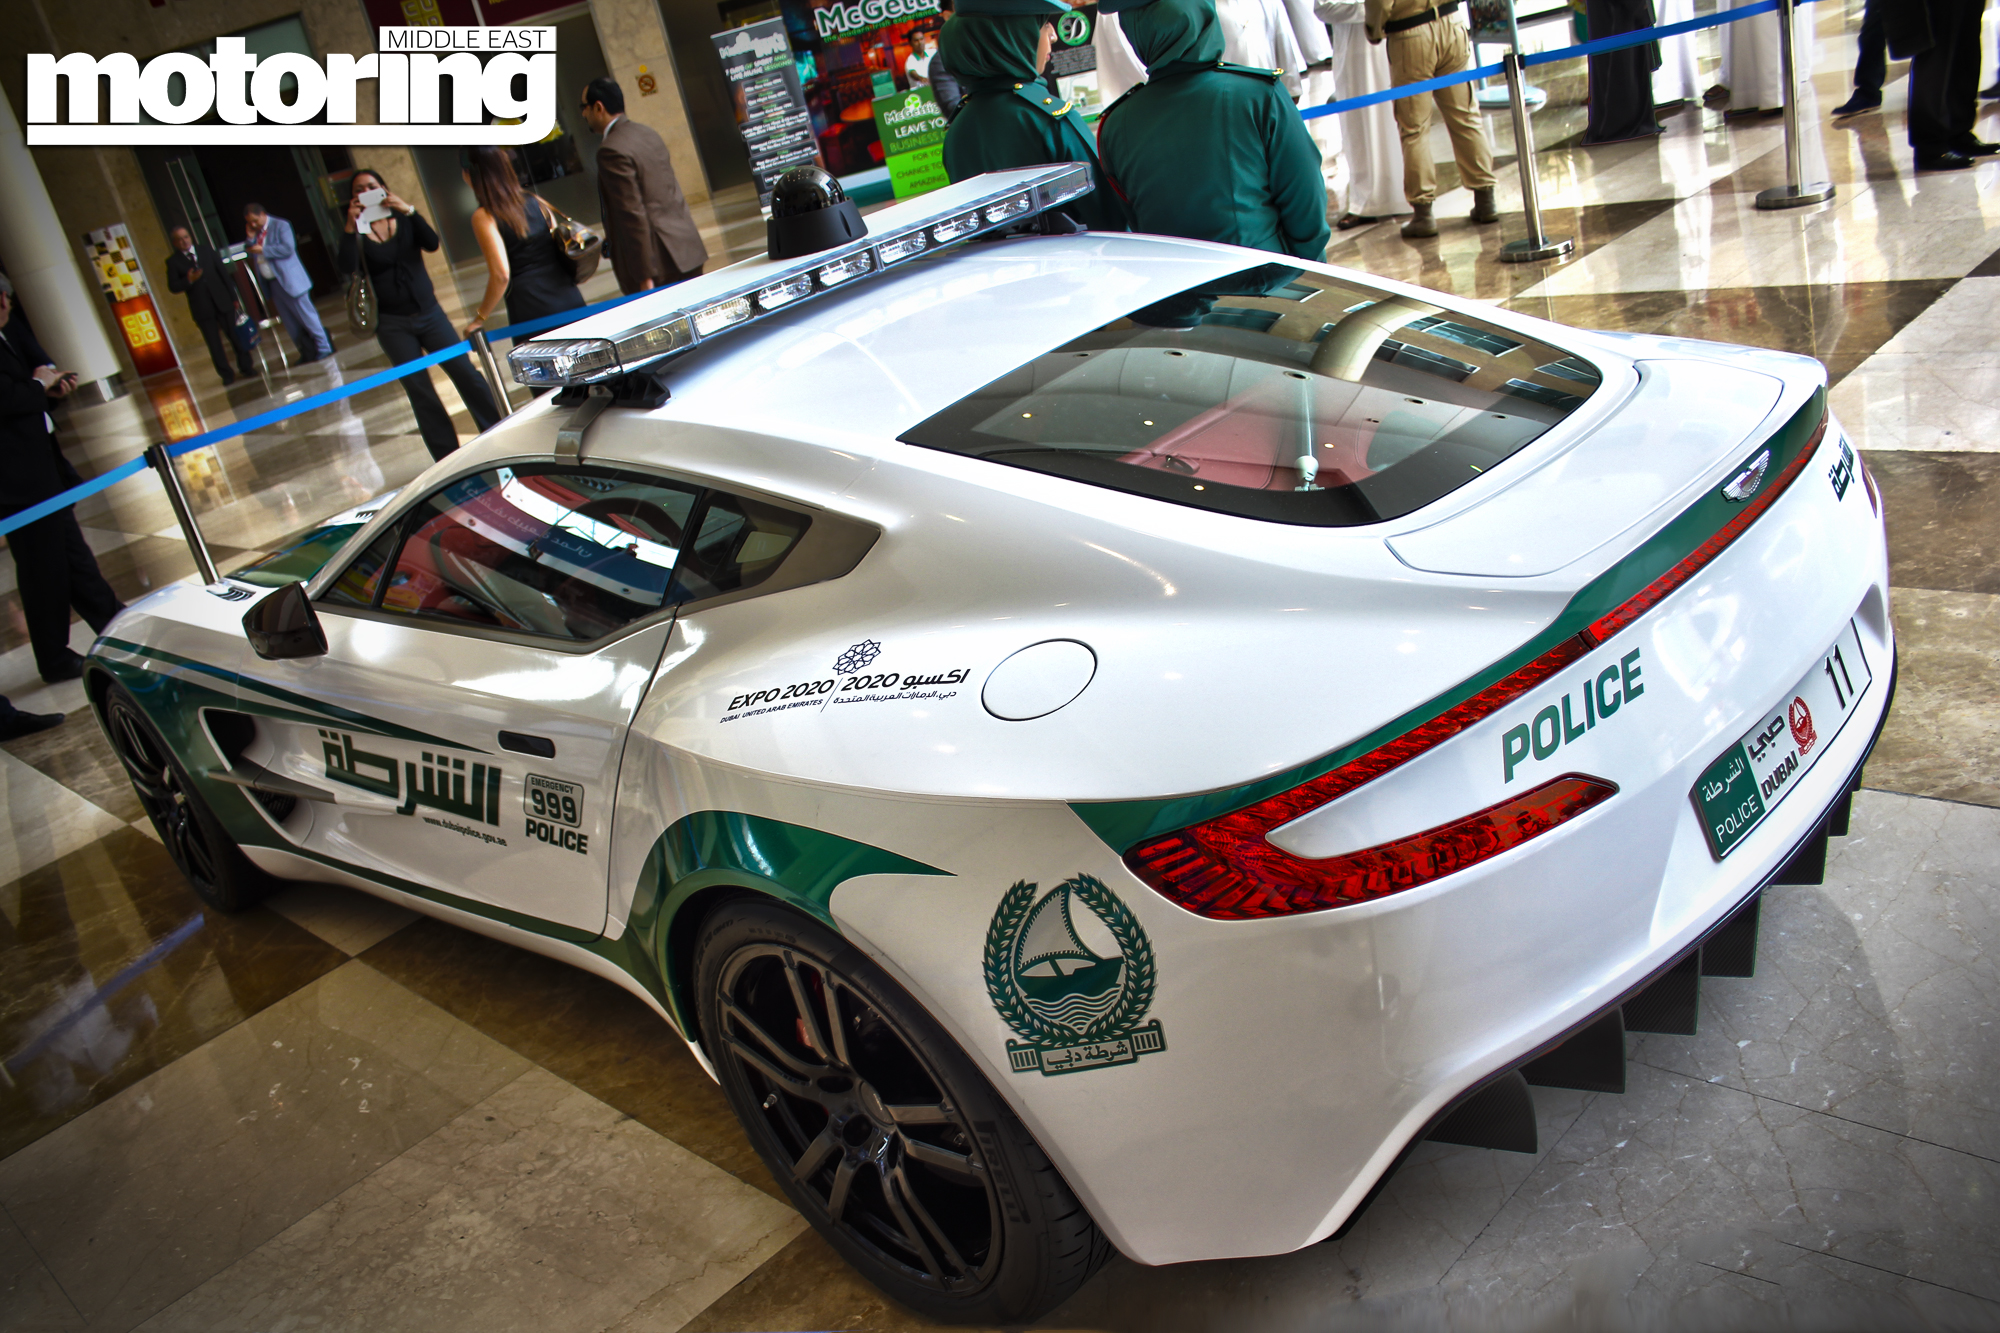 Dubai police supercars (video) - Motoring Middle East: Car